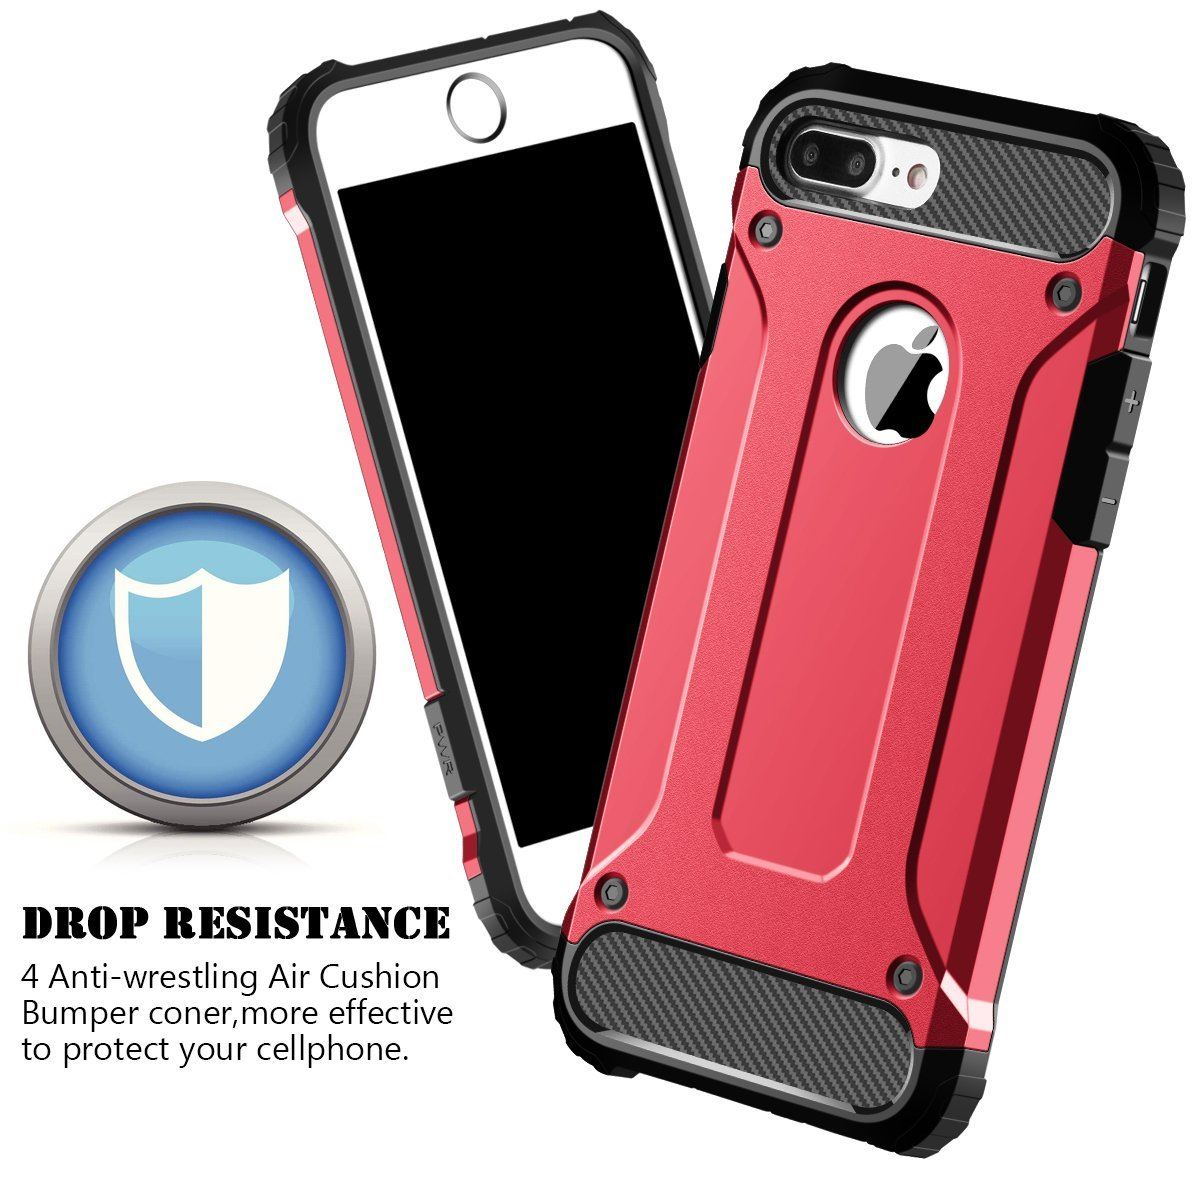 thumbnail 75 - For Apple iPhone 11 Pro Max XR Xs X 8 7 Plus 6 5 Se Case Cover Impact Heavy Duty